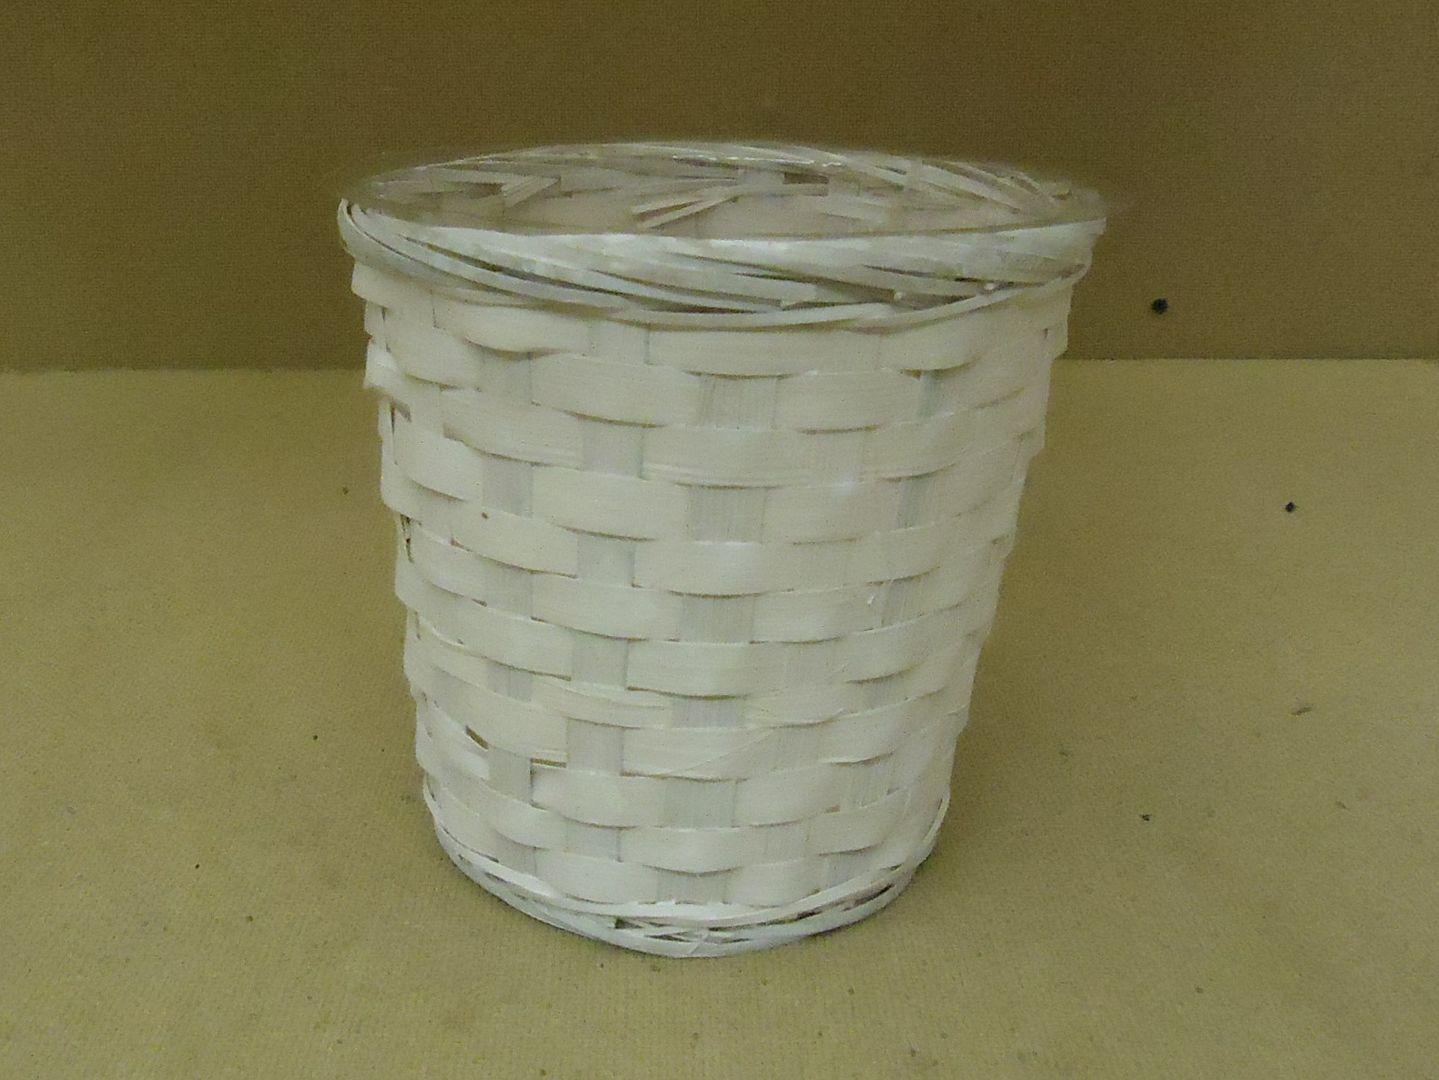 kk9779 010713-906a Designer Pot Container 7in H x 7in Diameter White Plastic Liner Wicker